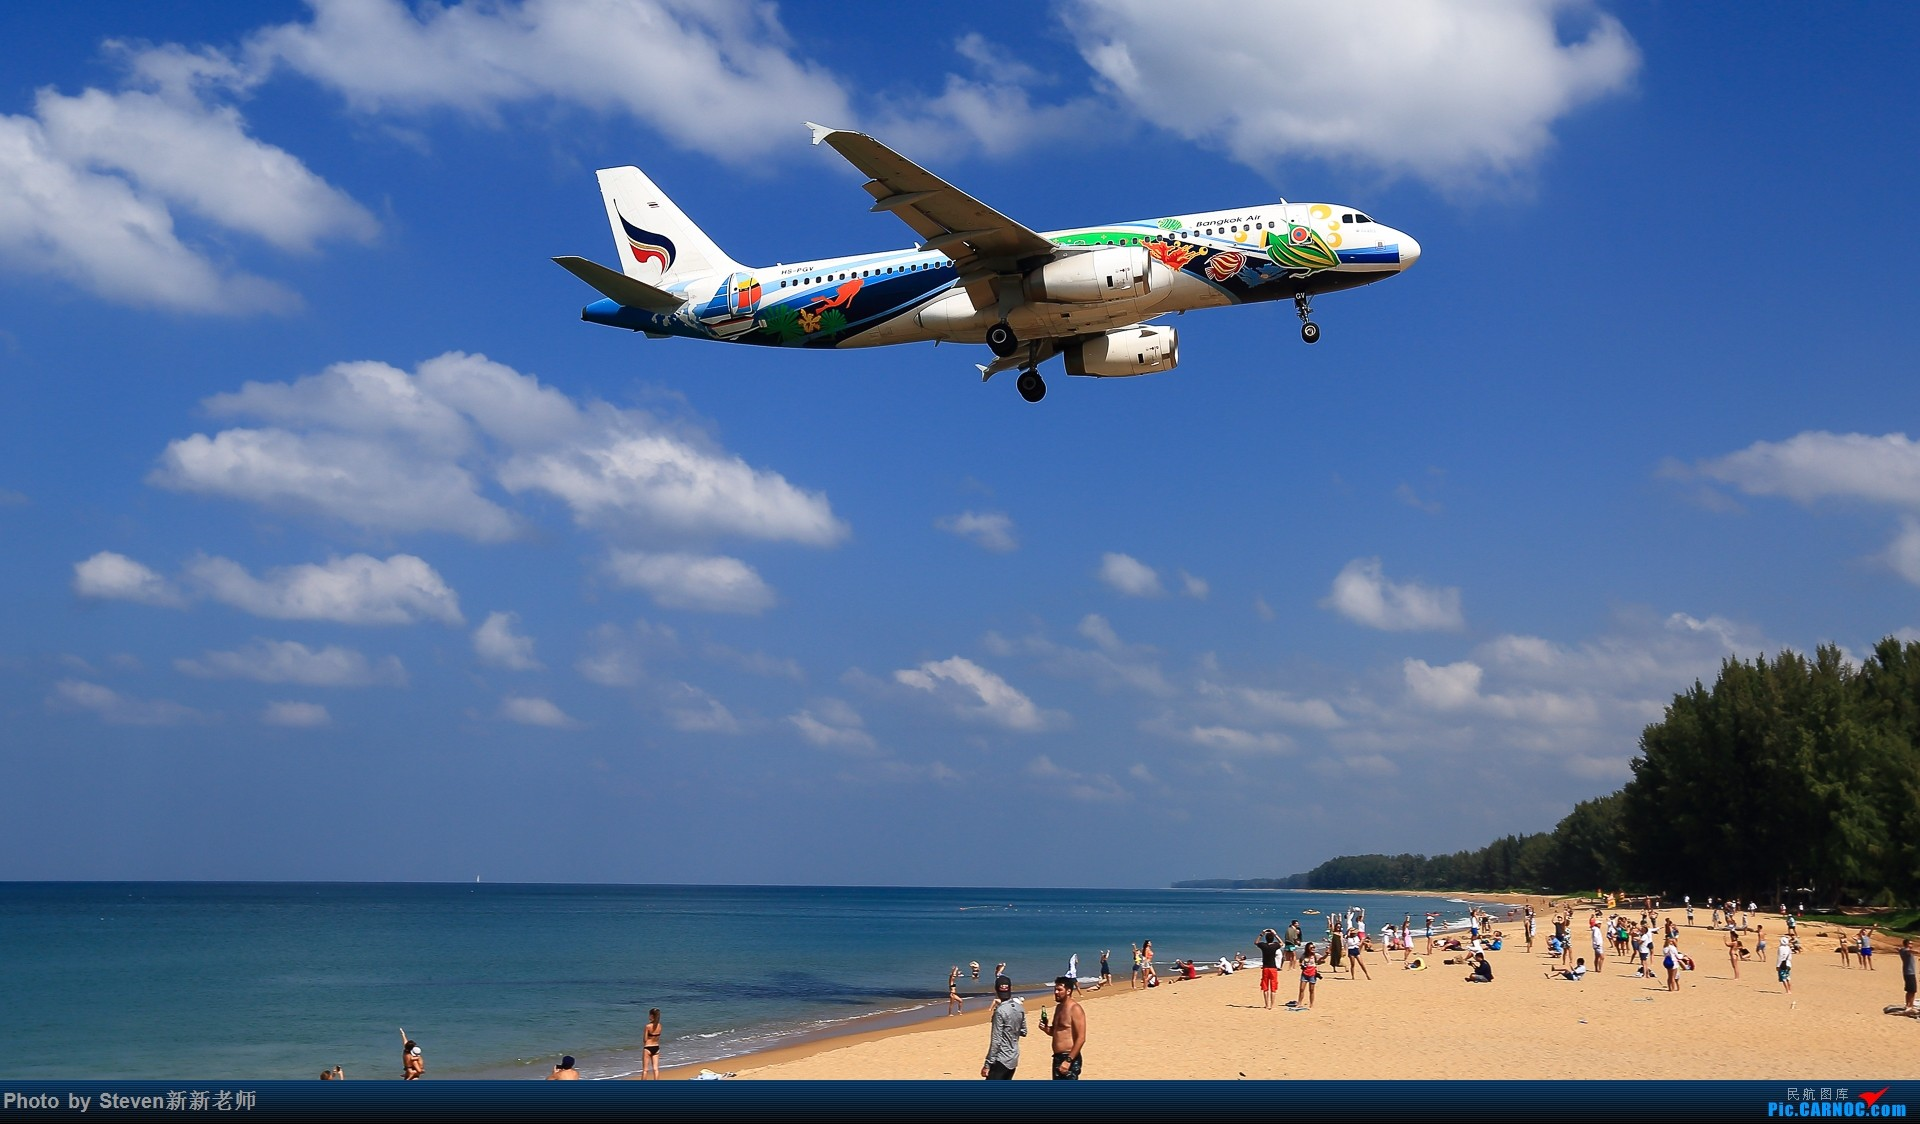 "Re:[原创]亚洲""圣马丁岛""—普吉国际机场拍机 AIRBUS A320-200 HS-PGV 泰国普吉机场"